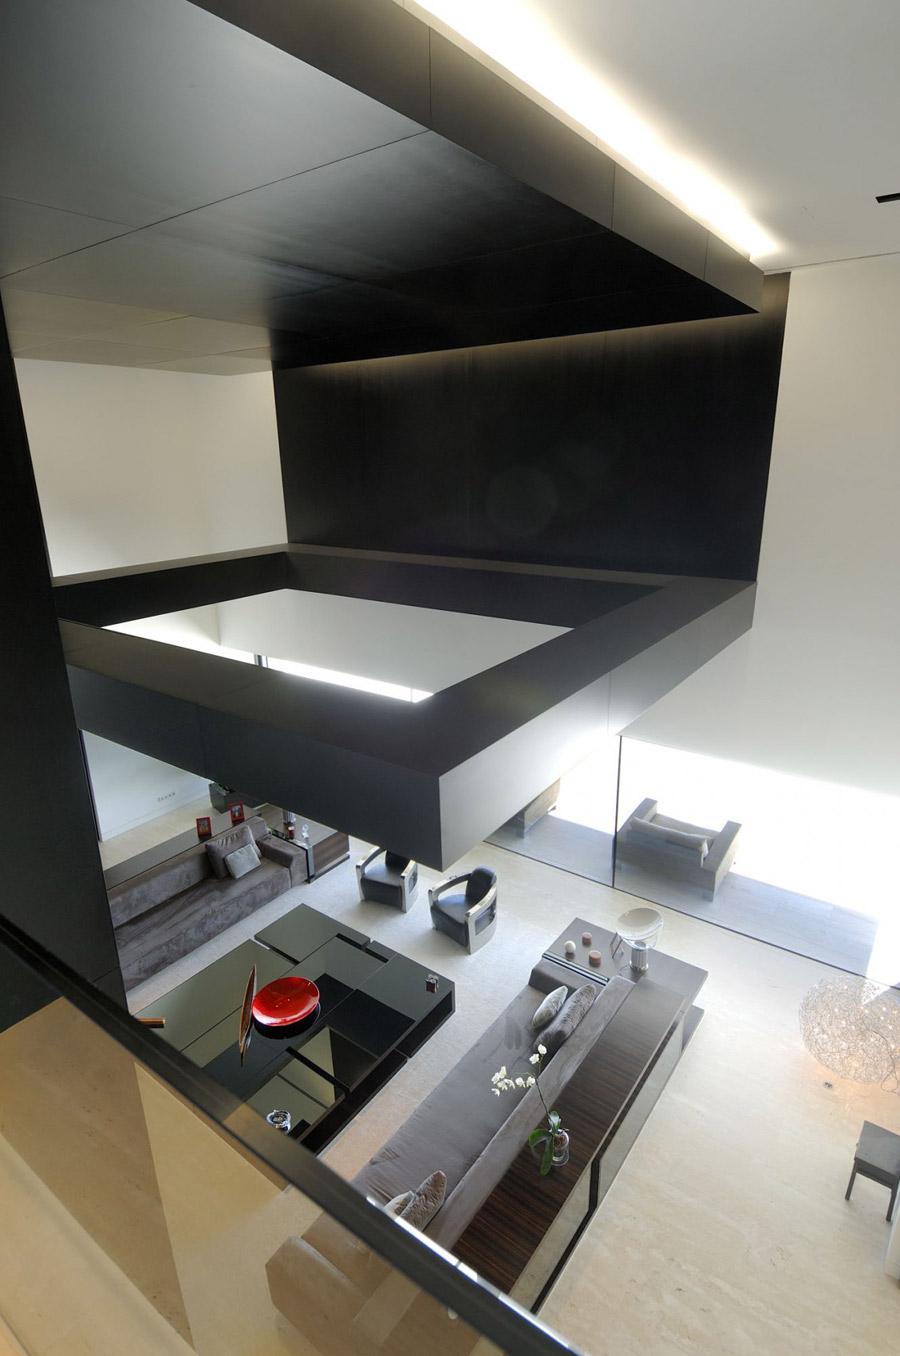 Living Space, The Vivienda 19 by A-cero